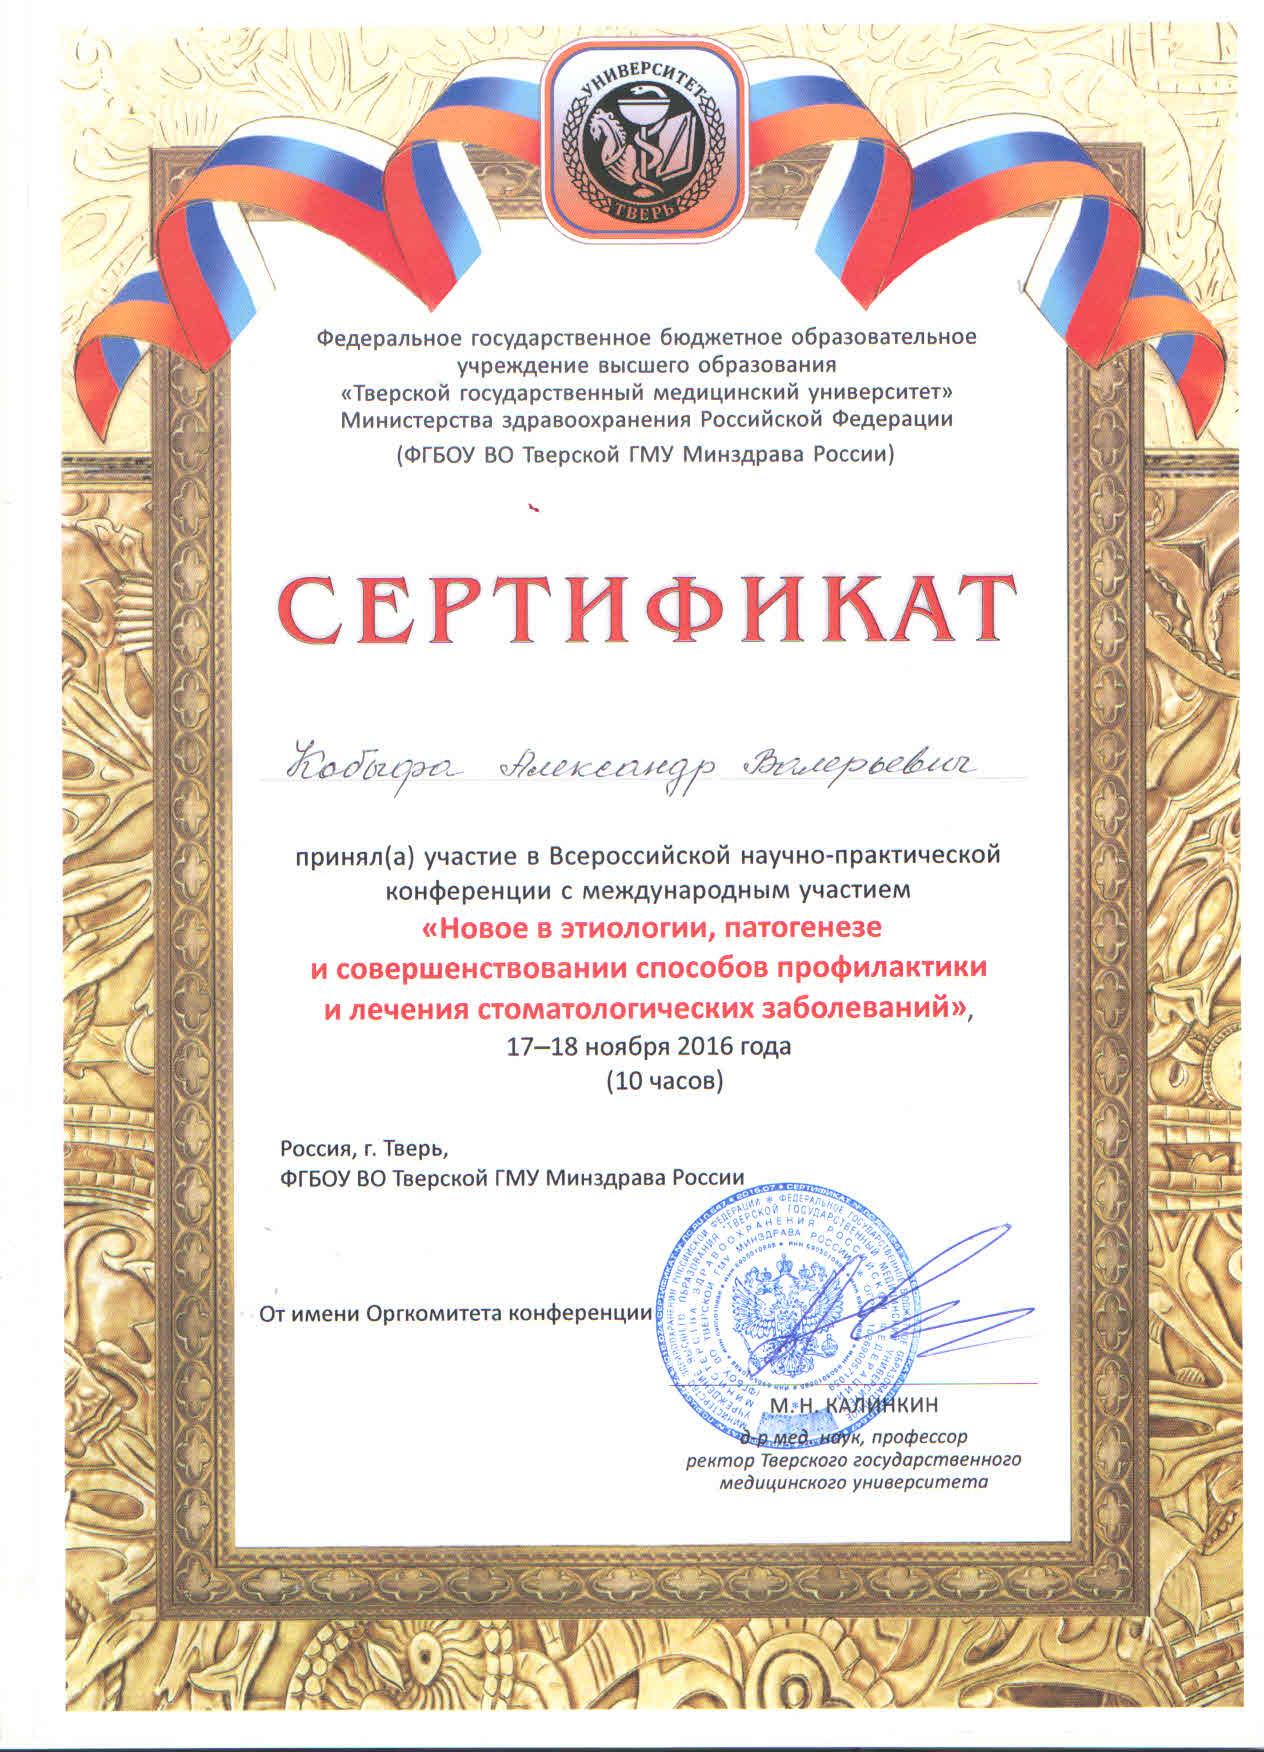 Сертификат 6.